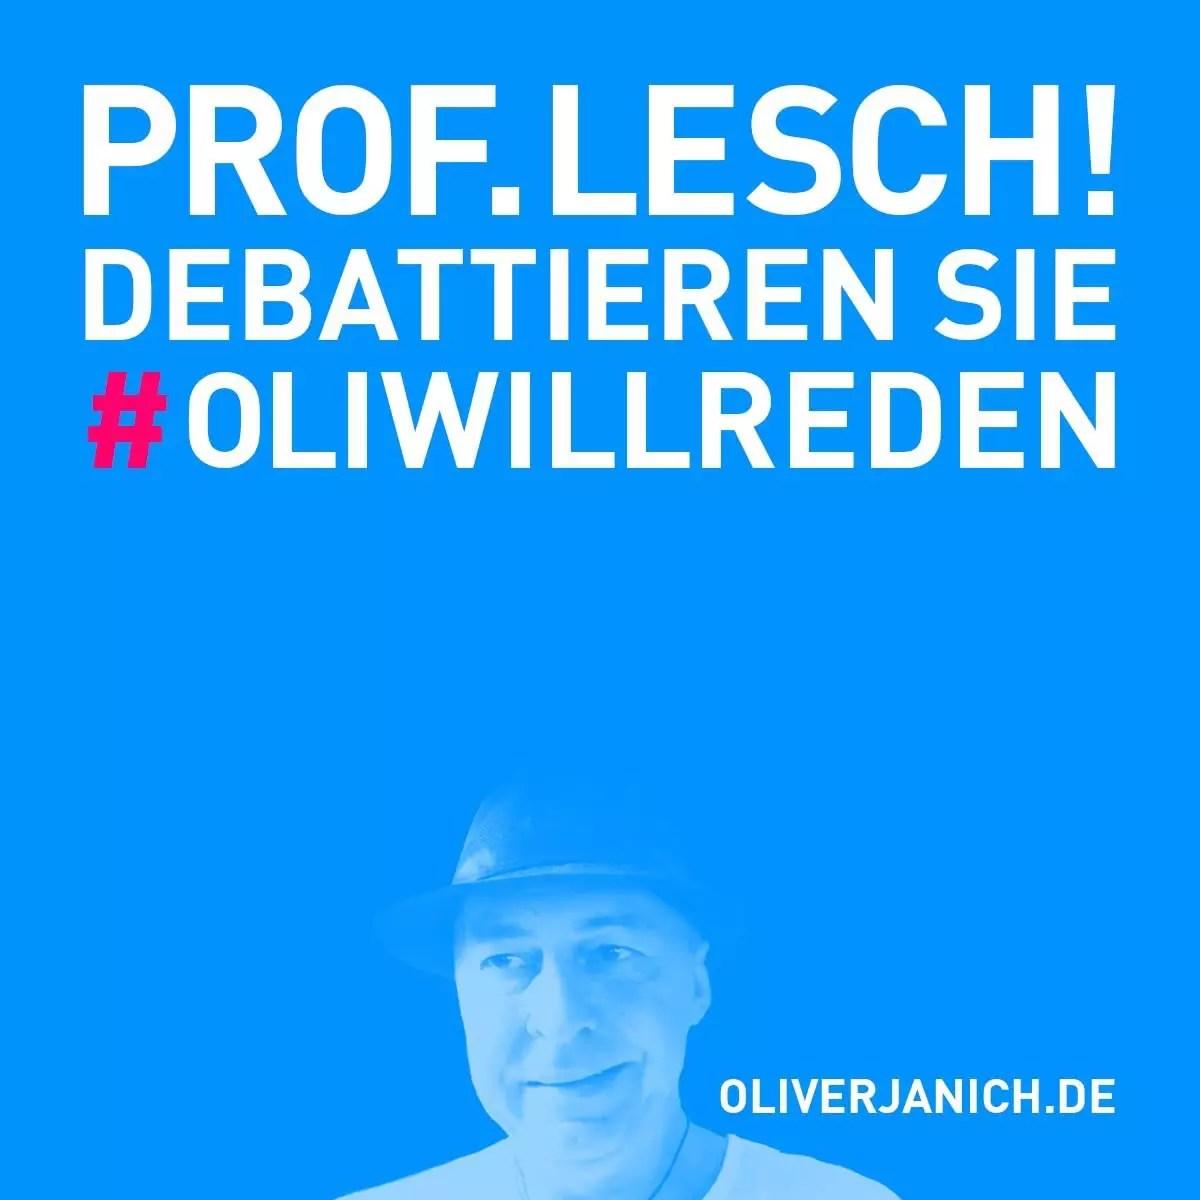 #OliWillReden Klimadebatte Oliver Janich Klimawandel #Rezo Prof. Lesch Terra X Lesch & Co